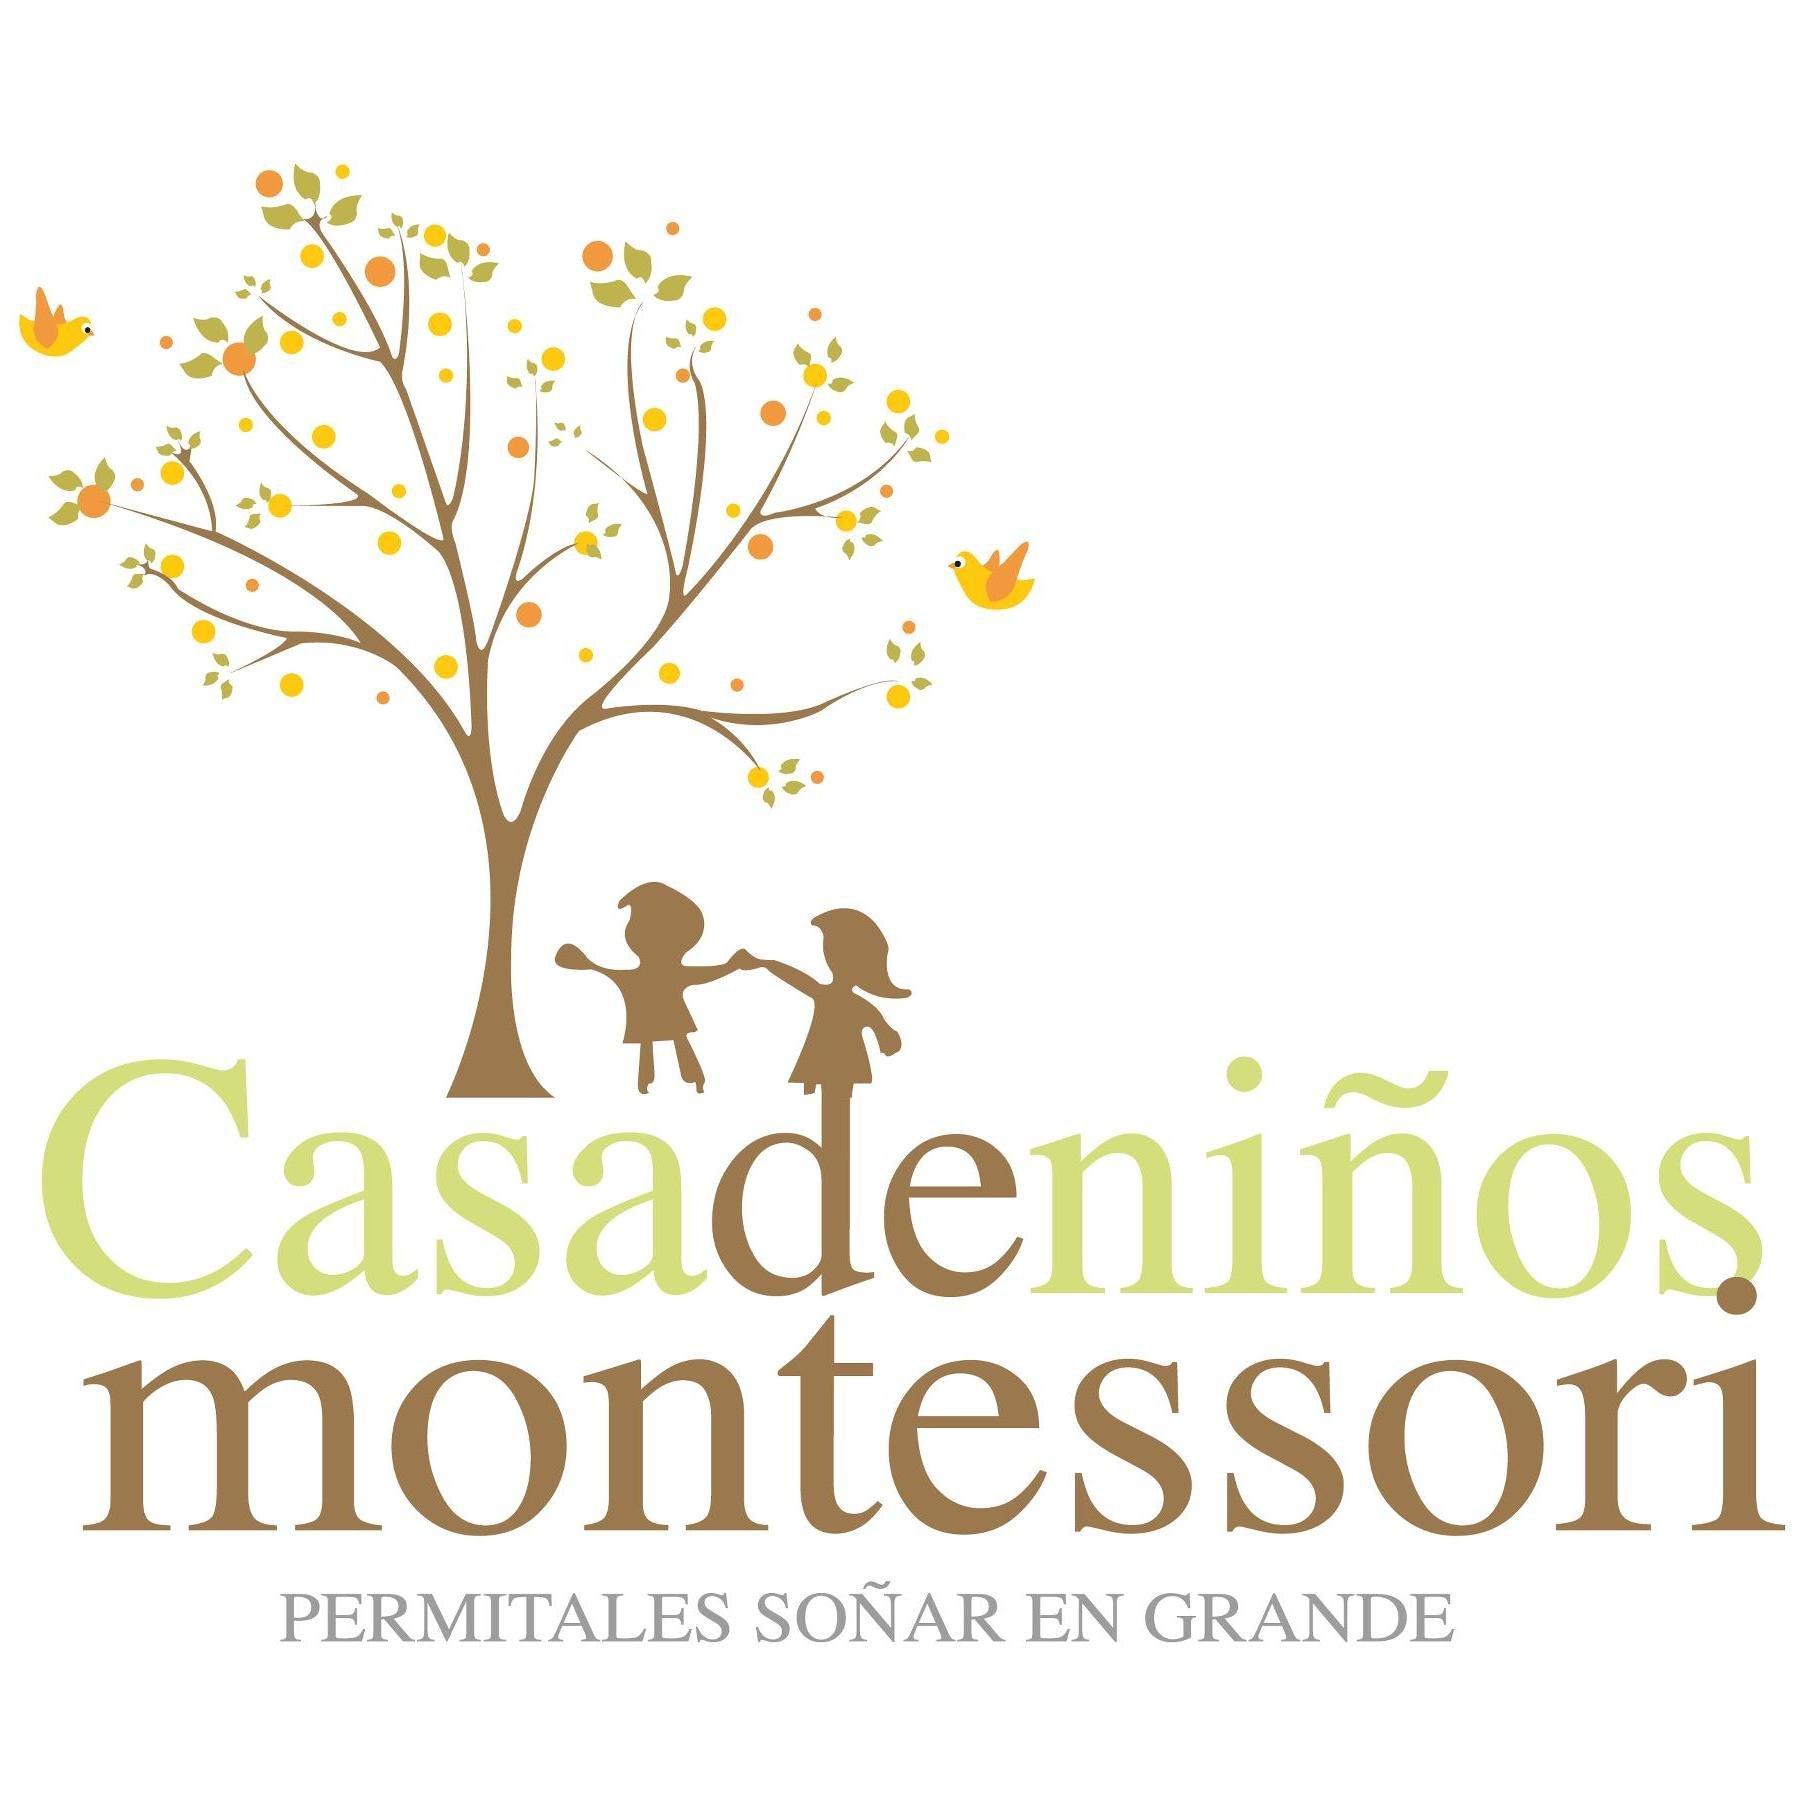 Casa de ni os mont montessori1988 twitter - Casas para ninos ...